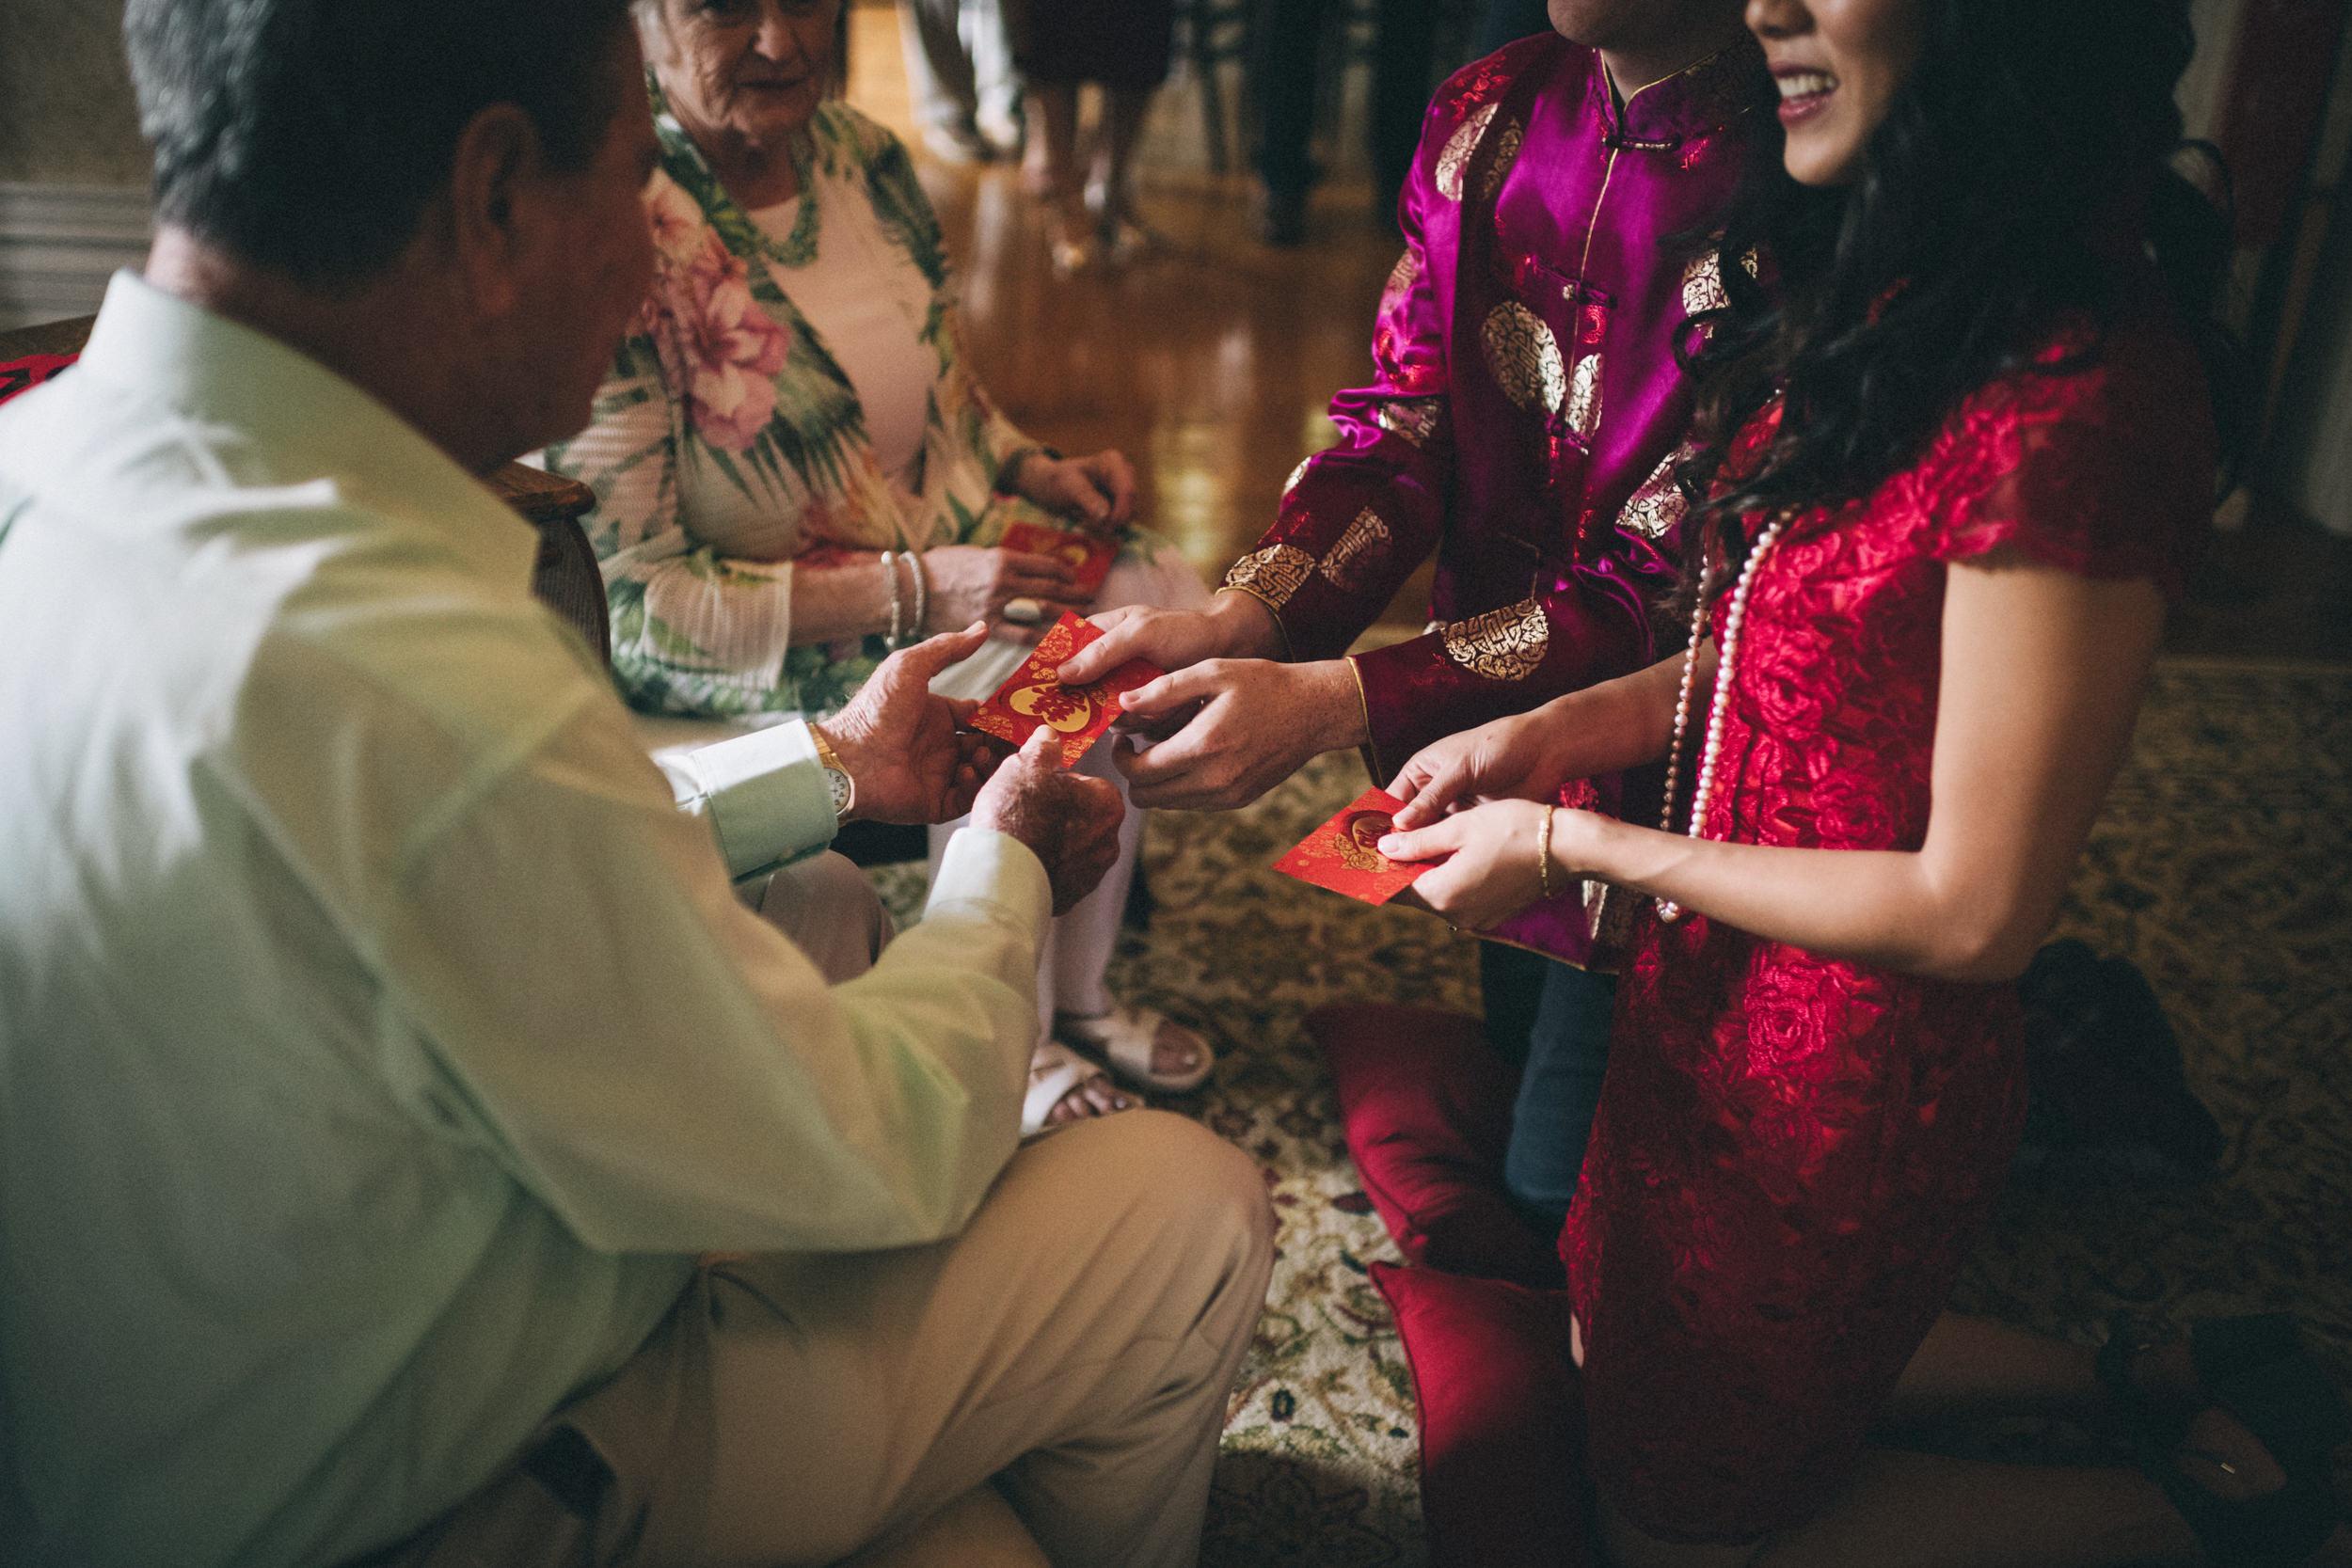 Louisville-Kentucky-Wedding-and-Elopement-Photographer-Sarah-Katherine-Davis-Photography-Summer-Jewel-Toned-Wedding-Chineese-Tea-Ceremony-Warrenwood-Manor-Danville-373.jpg